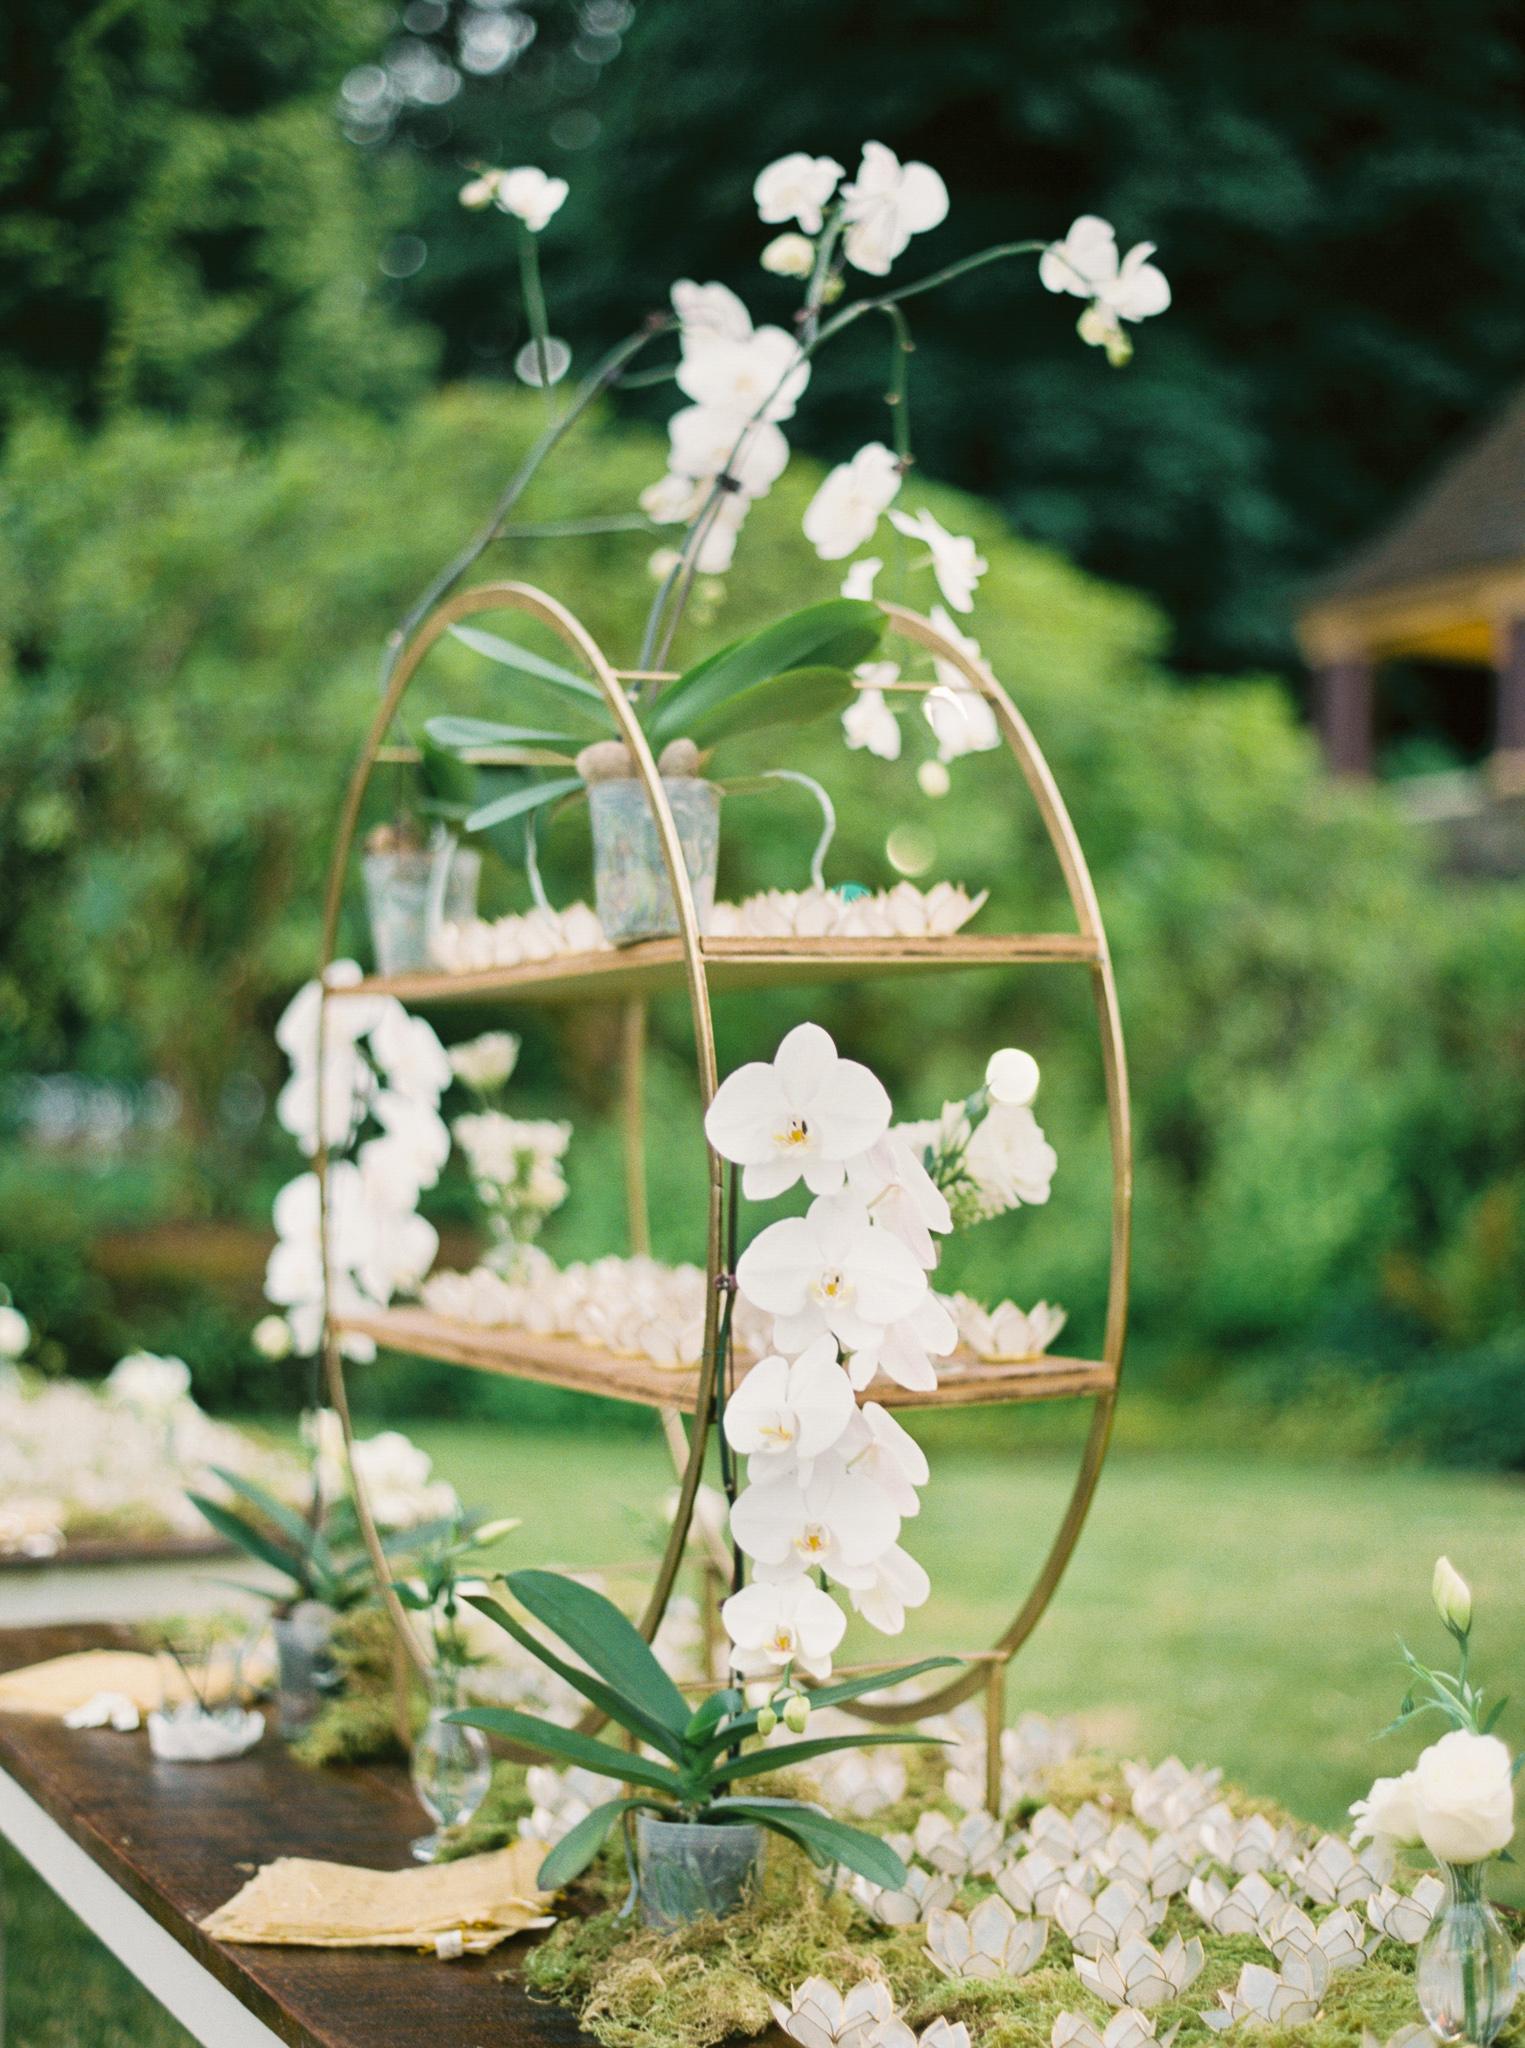 187OutliveCreative_Travel_Photographer_Videographer_Lewis&Clark_Oregon_Elegant_BlackTie_Destination_Wedding.jpg